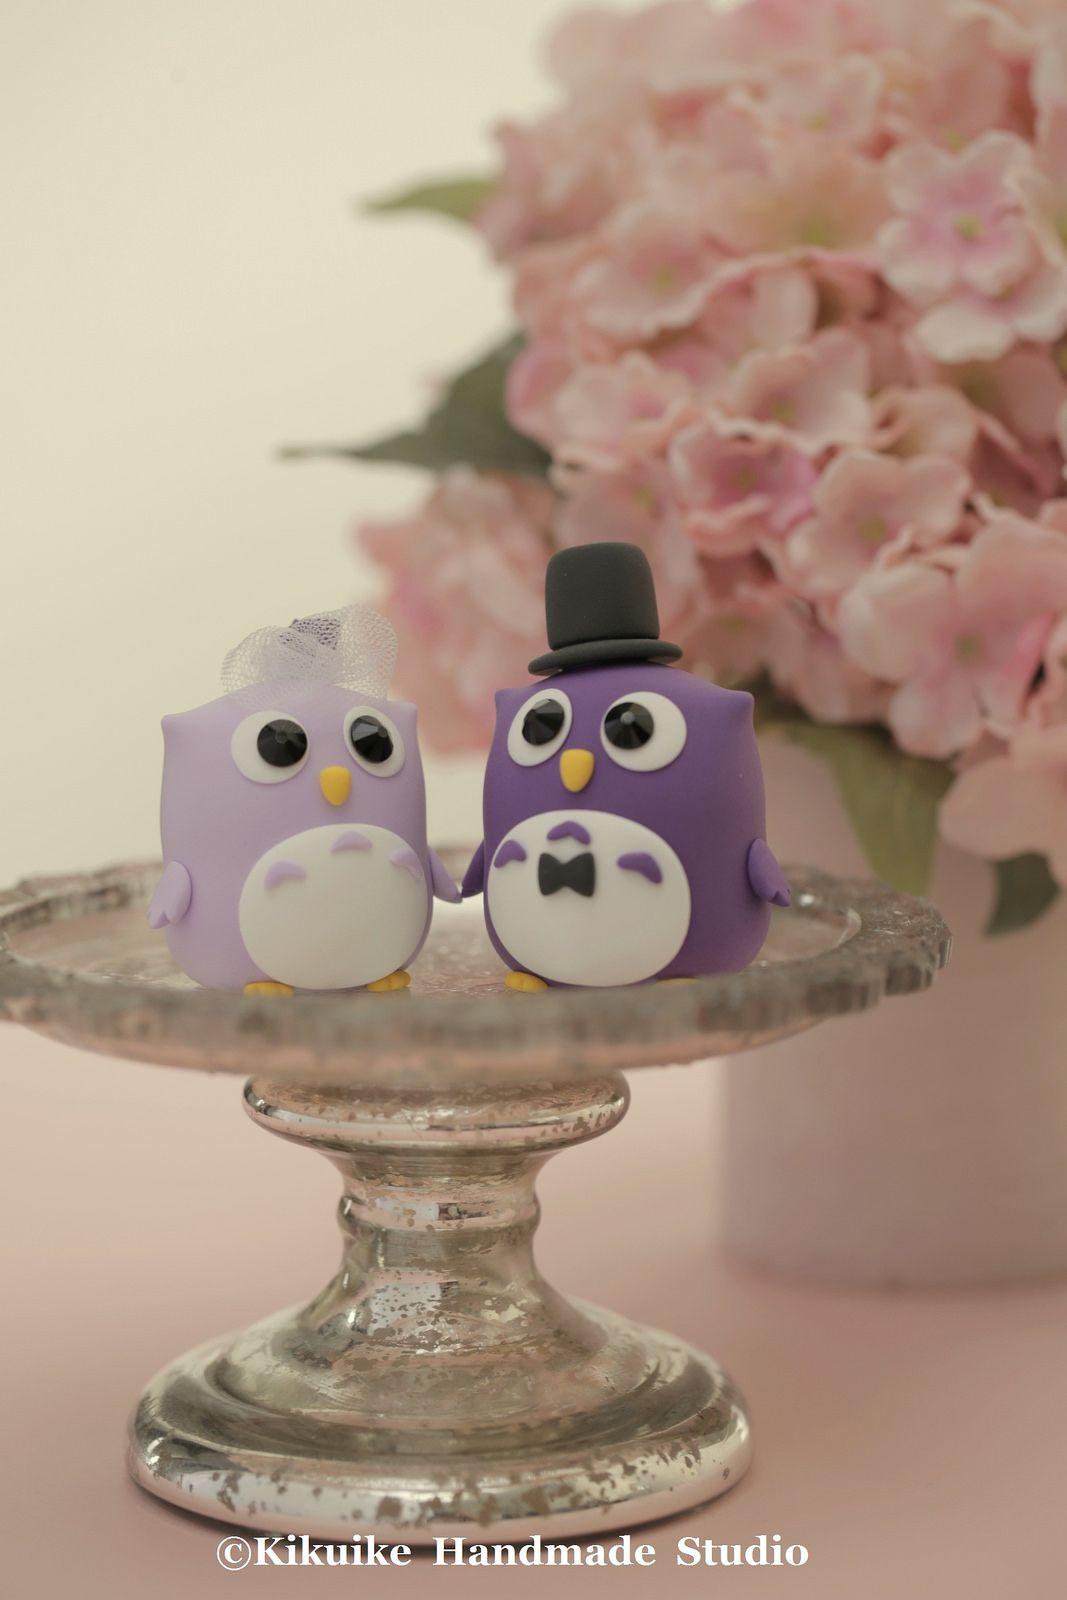 Owls wedding cake topper #forestwedding #weddingdetails #handmadewedding #claydoll #birdsaketopper #cakedecor